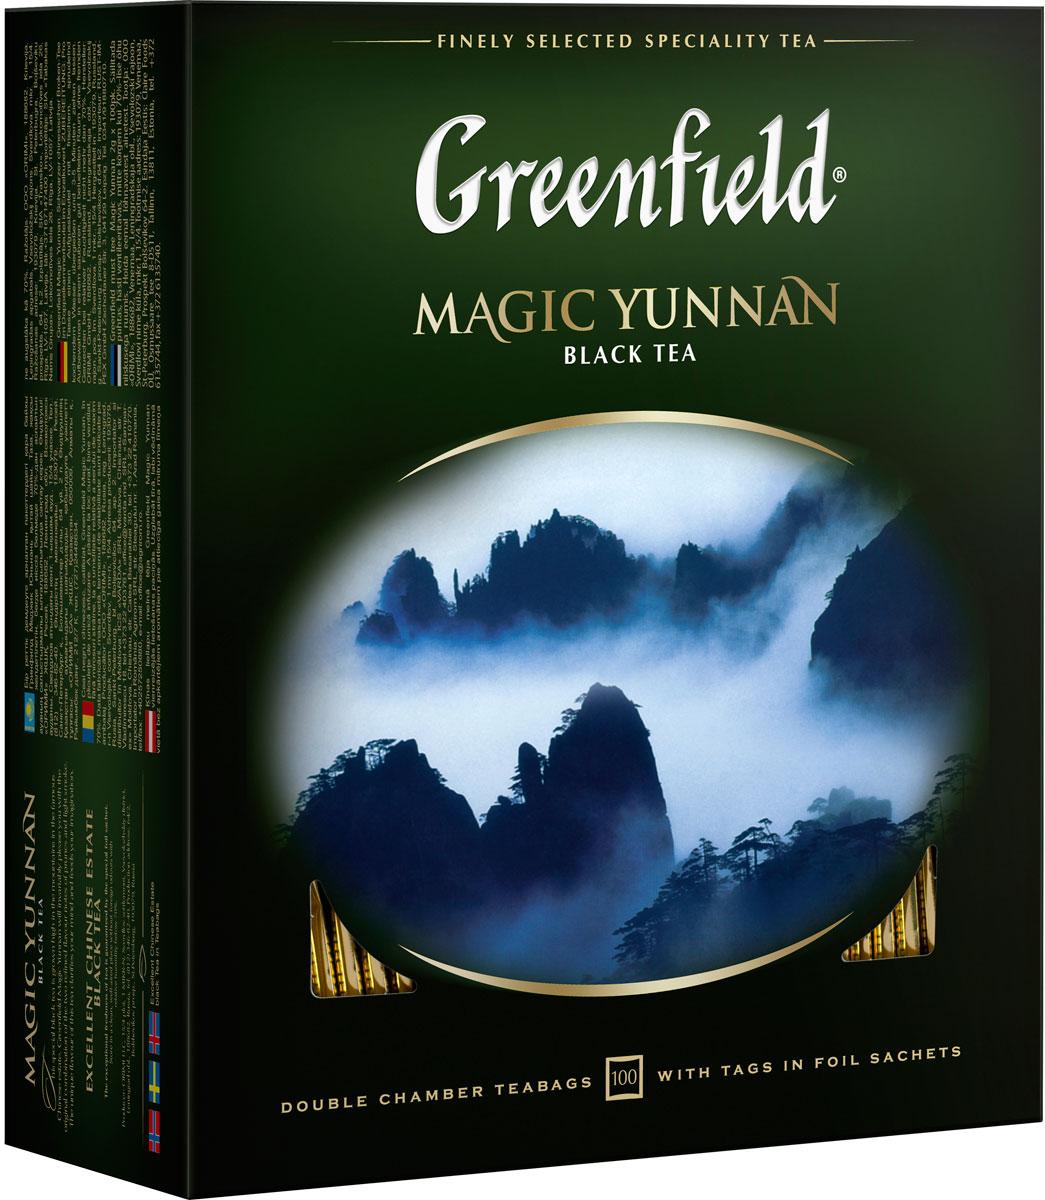 Greenfield Magic Yunnan черный чай в пакетиках, 100 шт цена